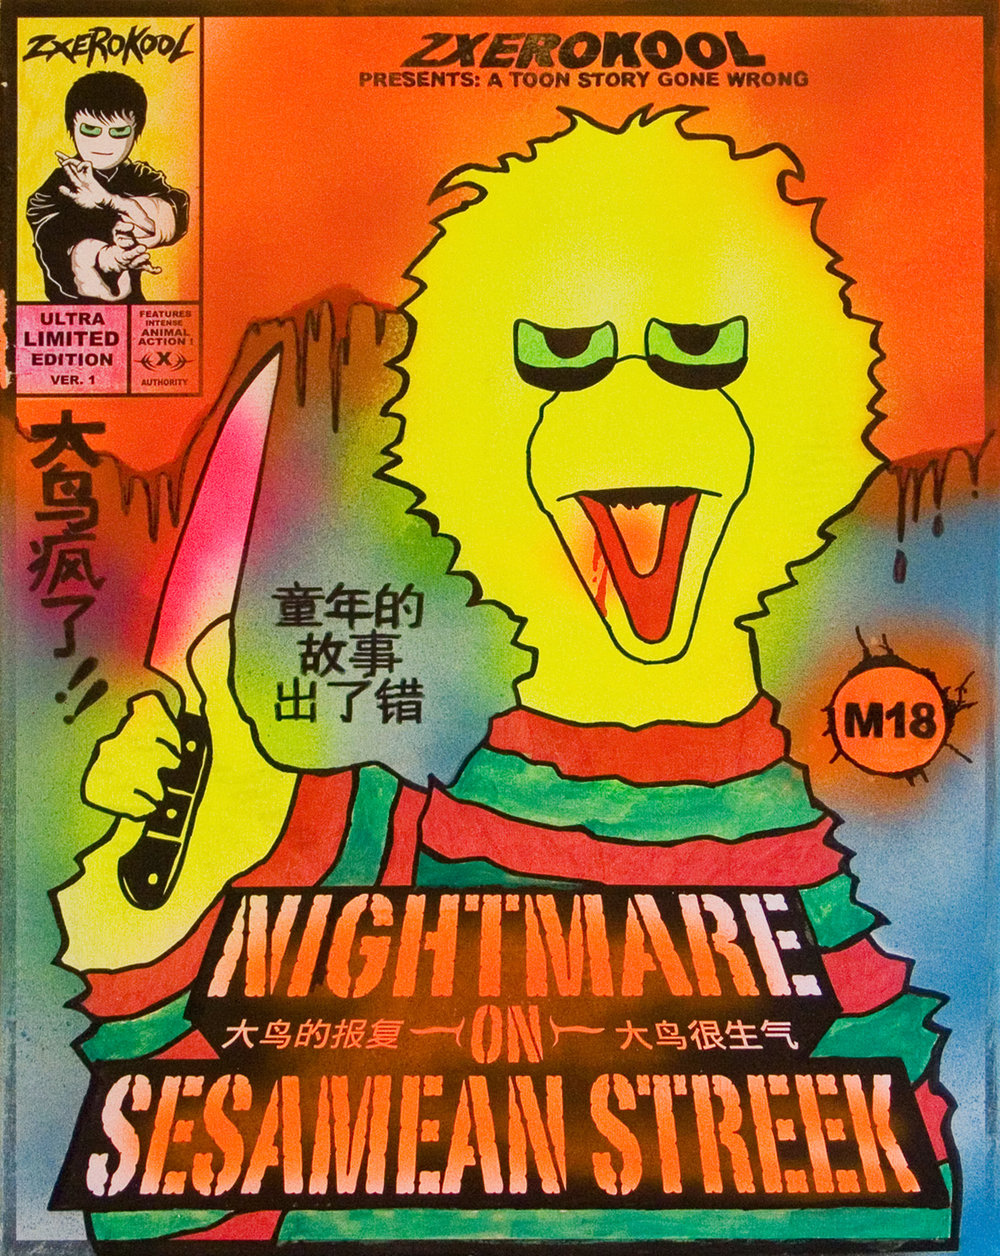 Nightmare on Sesamean Streek